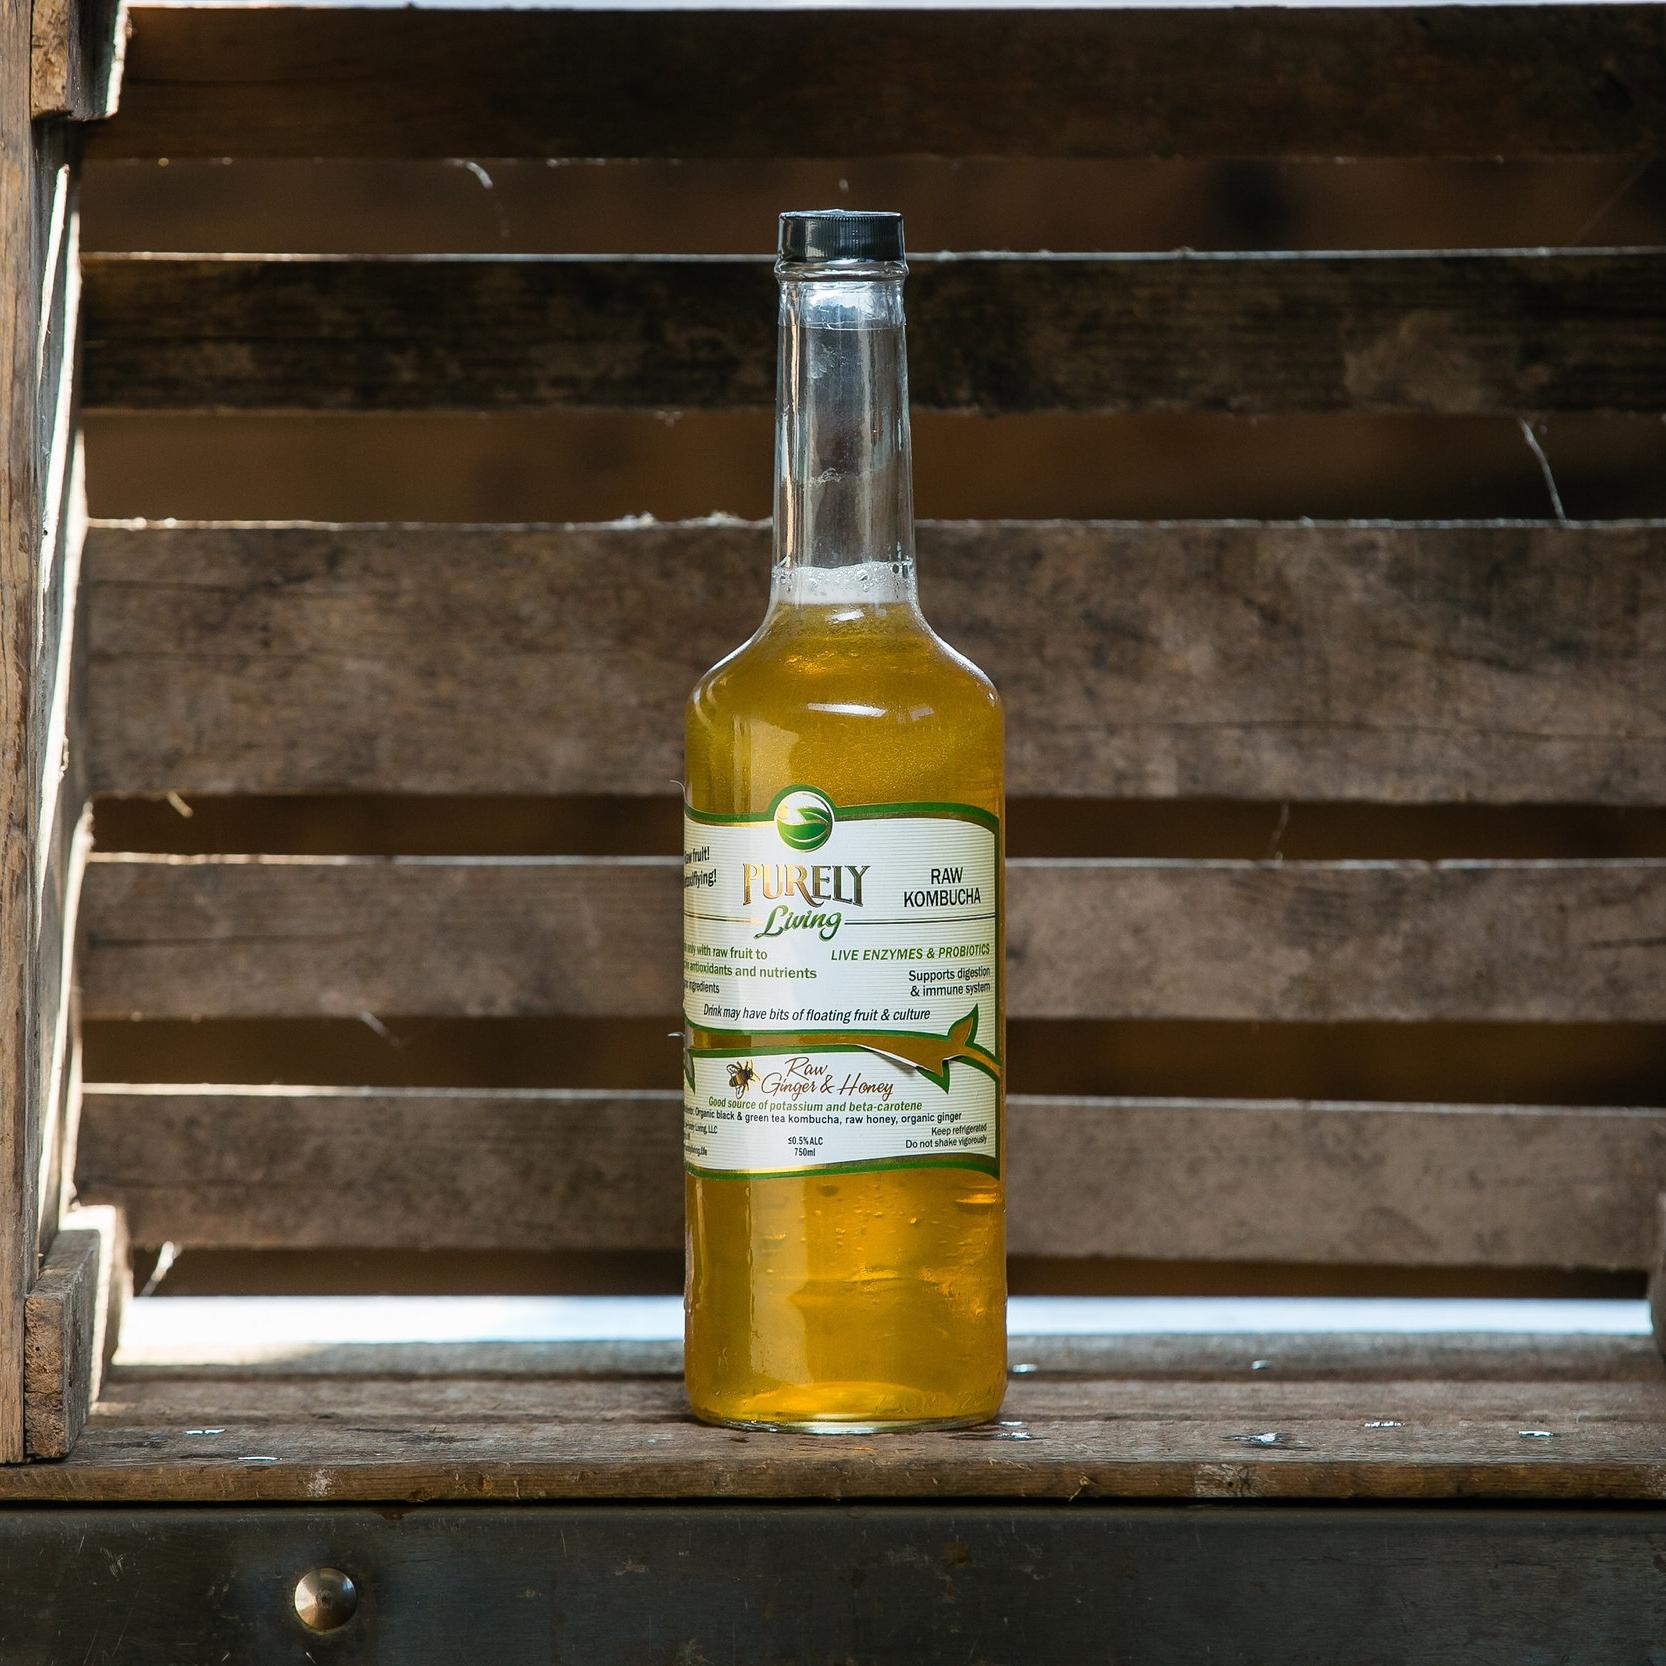 Ginger Honey - Ingredients: Organic Black and Green Tea Kombucha, Organic Raw Ginger, Wisconsin Natural Acres Raw Honey. More info.